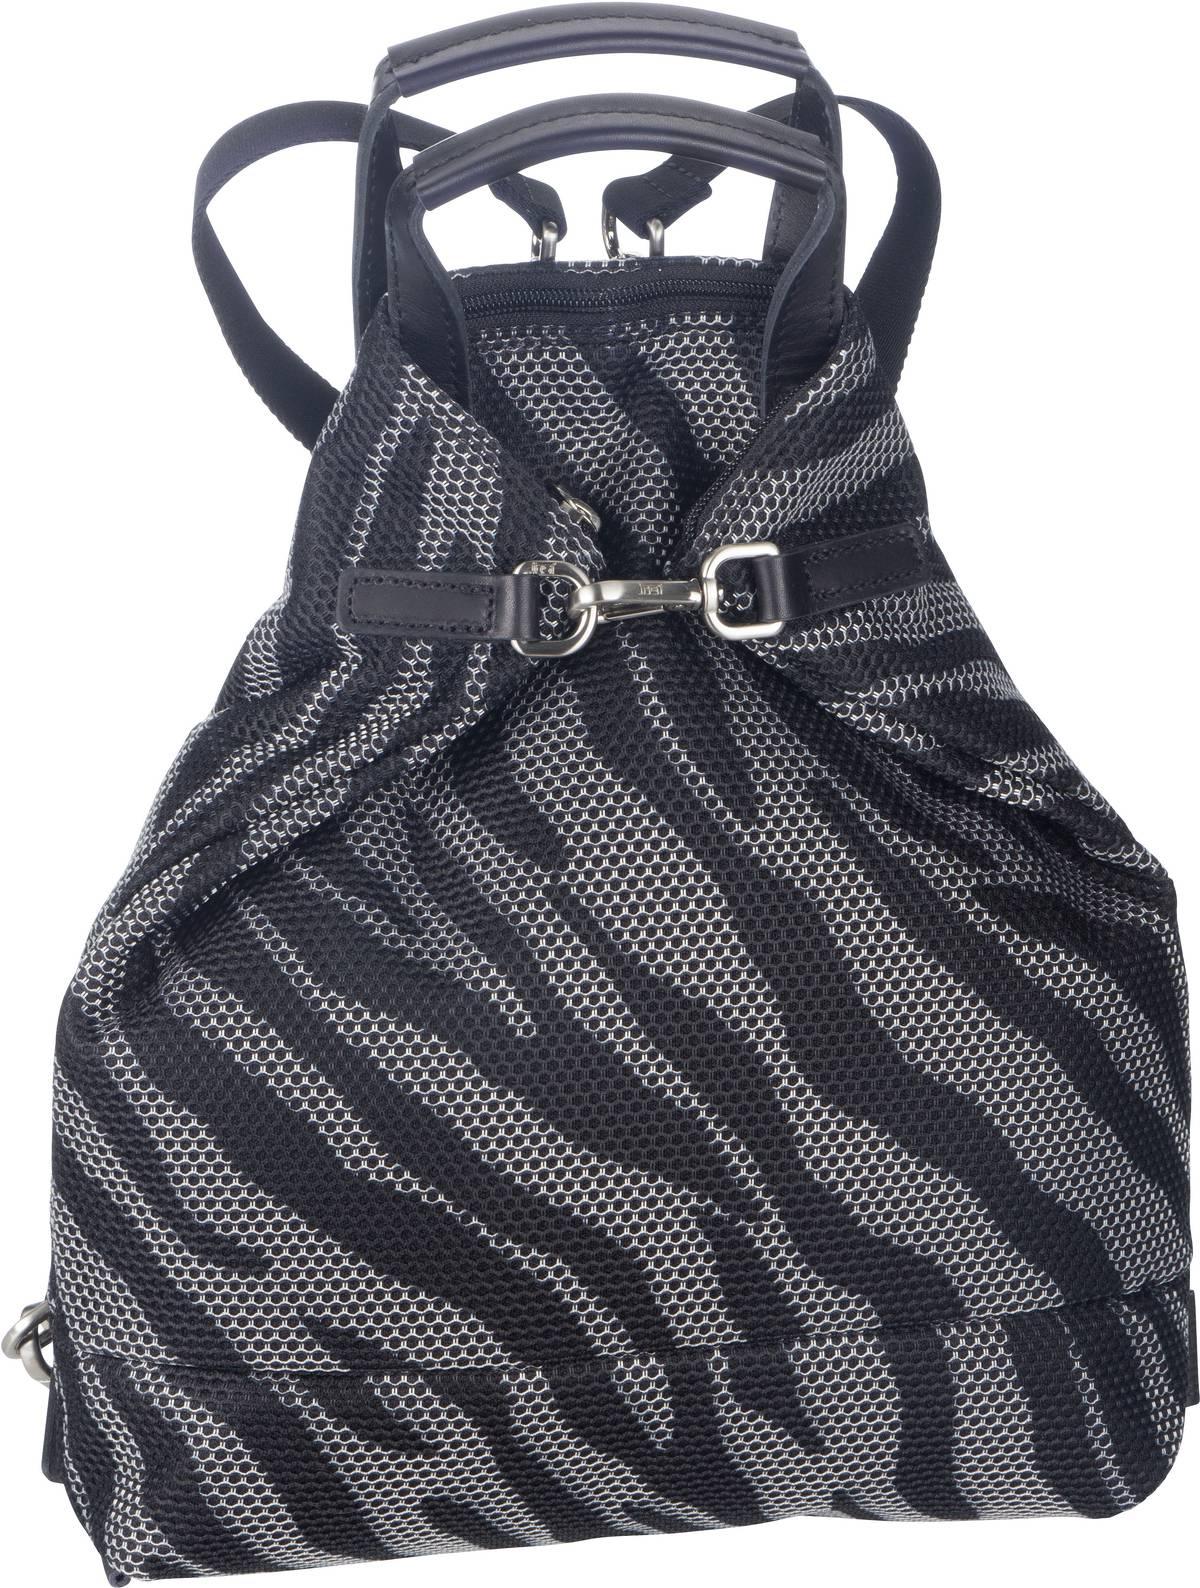 Rucksack / Daypack Mesh 6177 X-Change 3in1 Bag XS Zebra